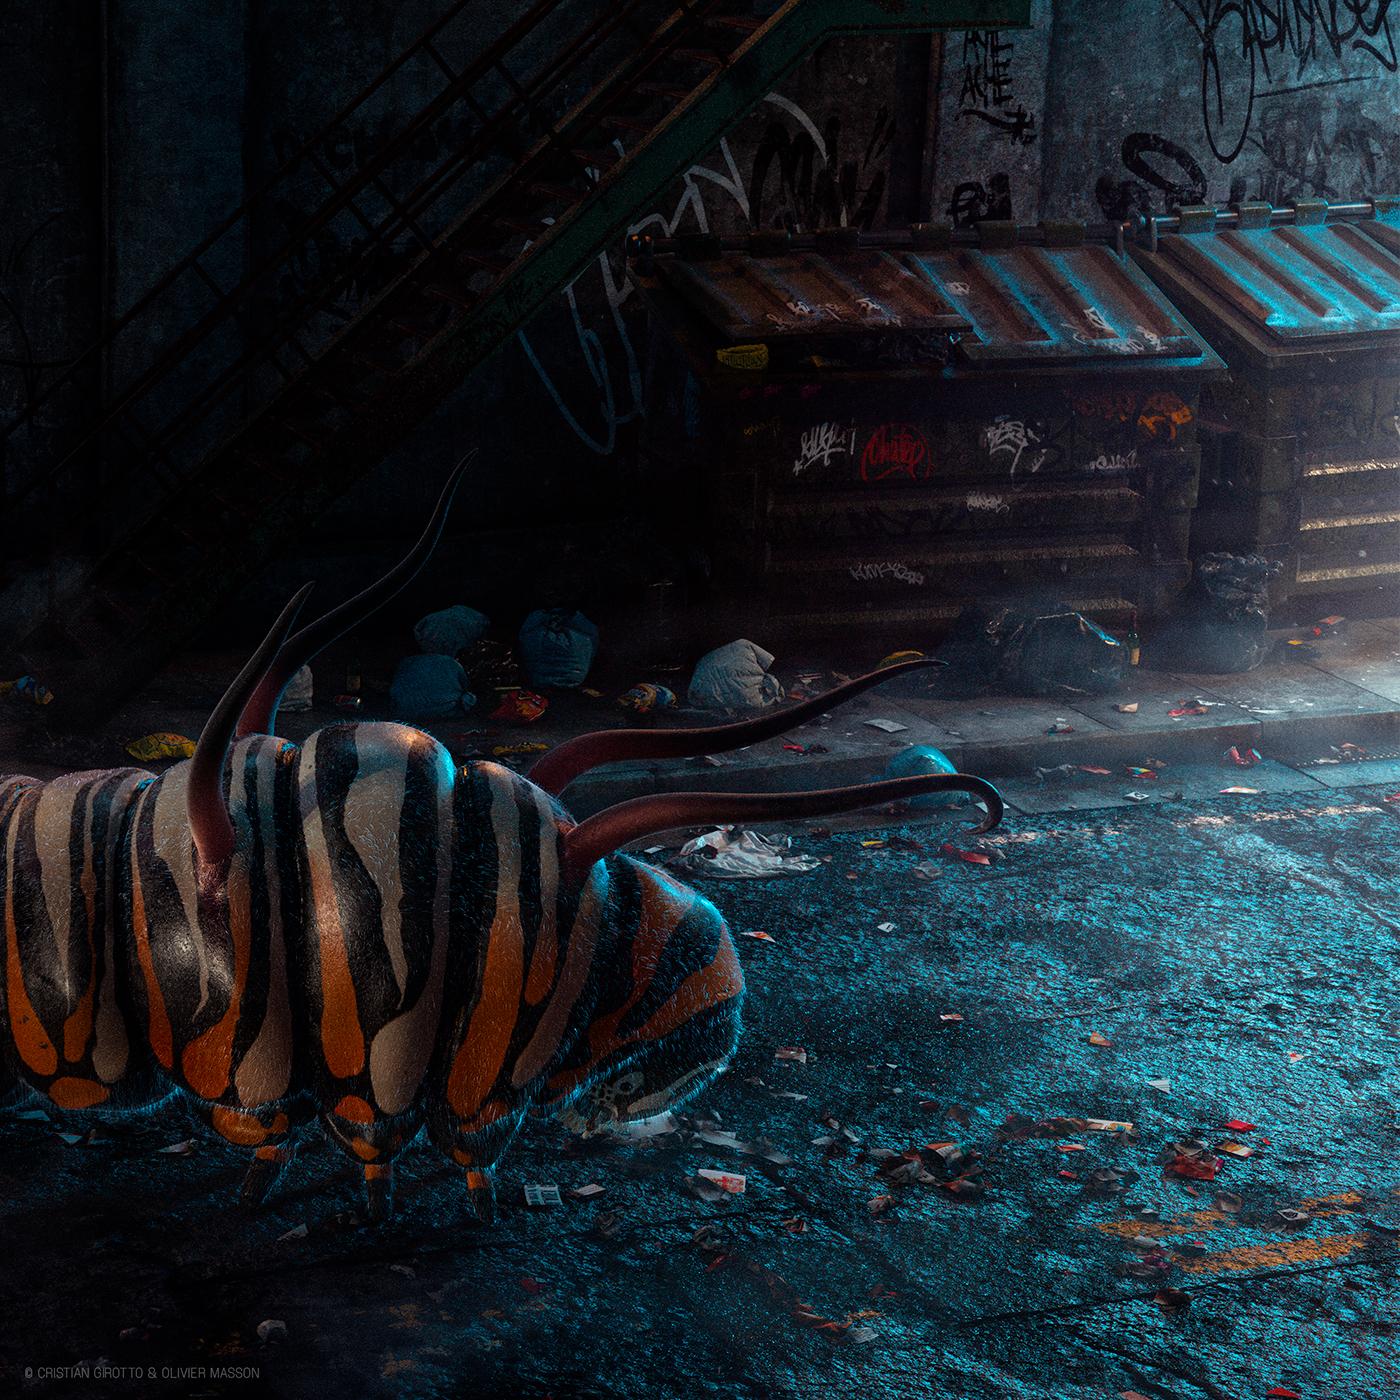 Caterpillar Digital Art  CGI 3D cristiangirotto  kafka passage Transformation art direction